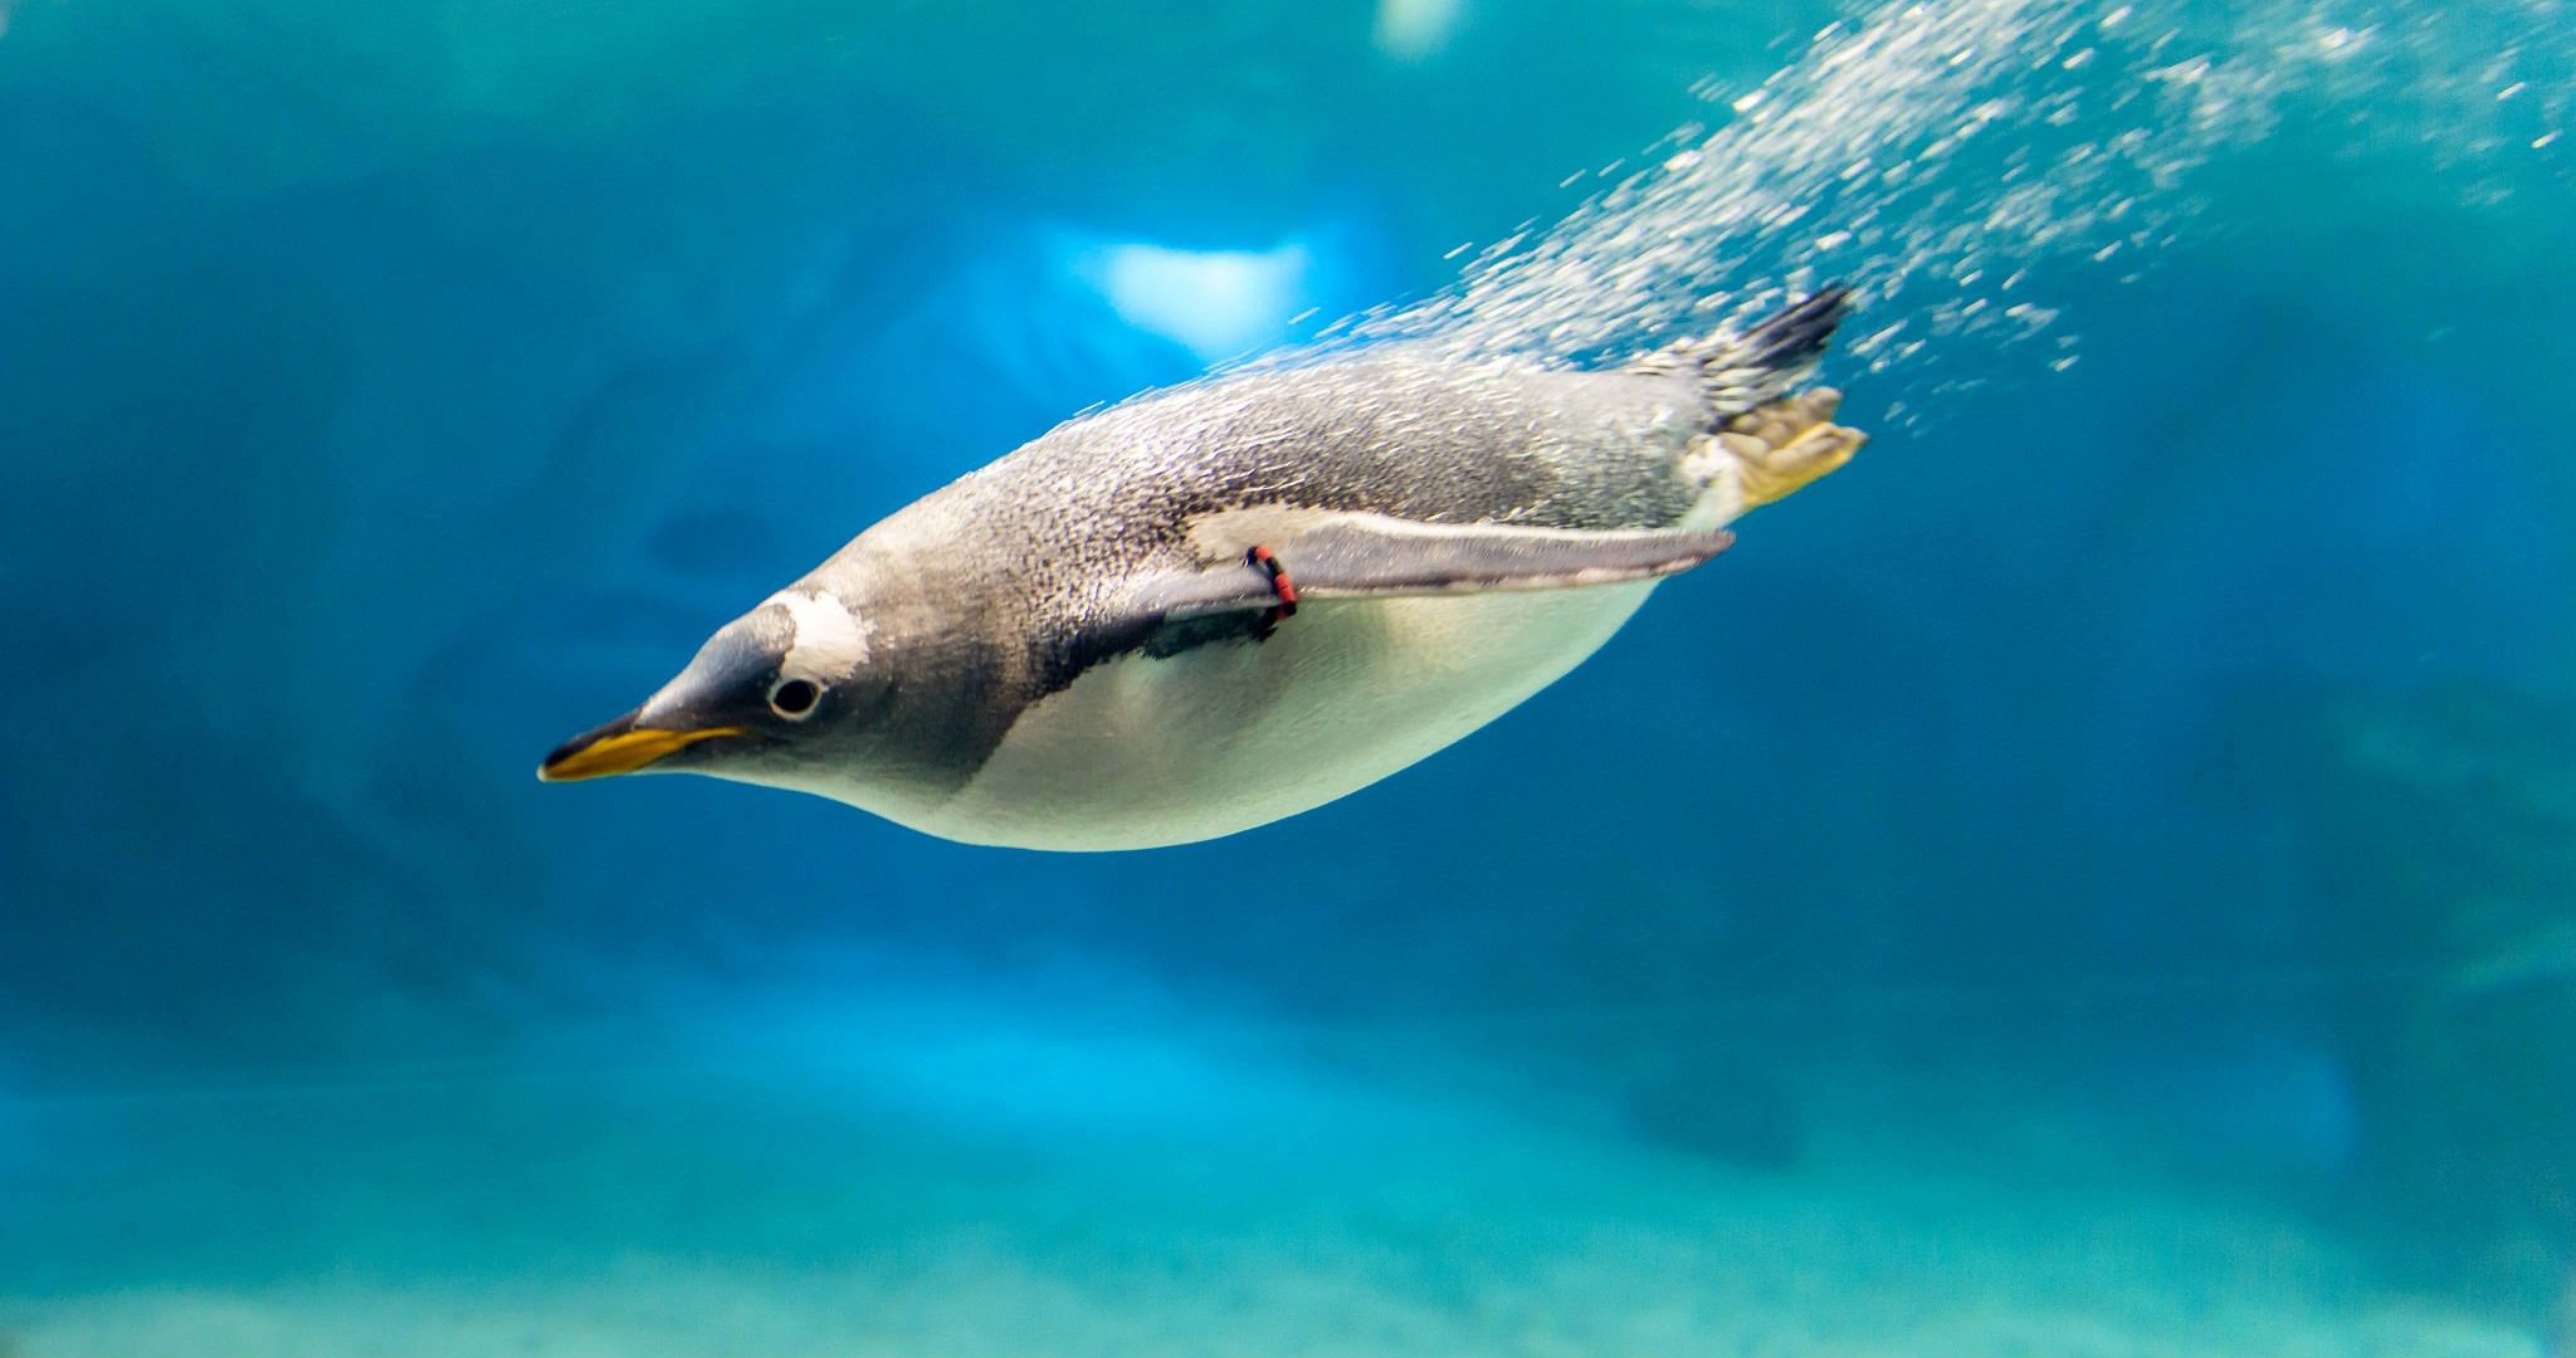 Penguin In Water 4k Ultra Hd Wallpaper Ololoshenka Penguins